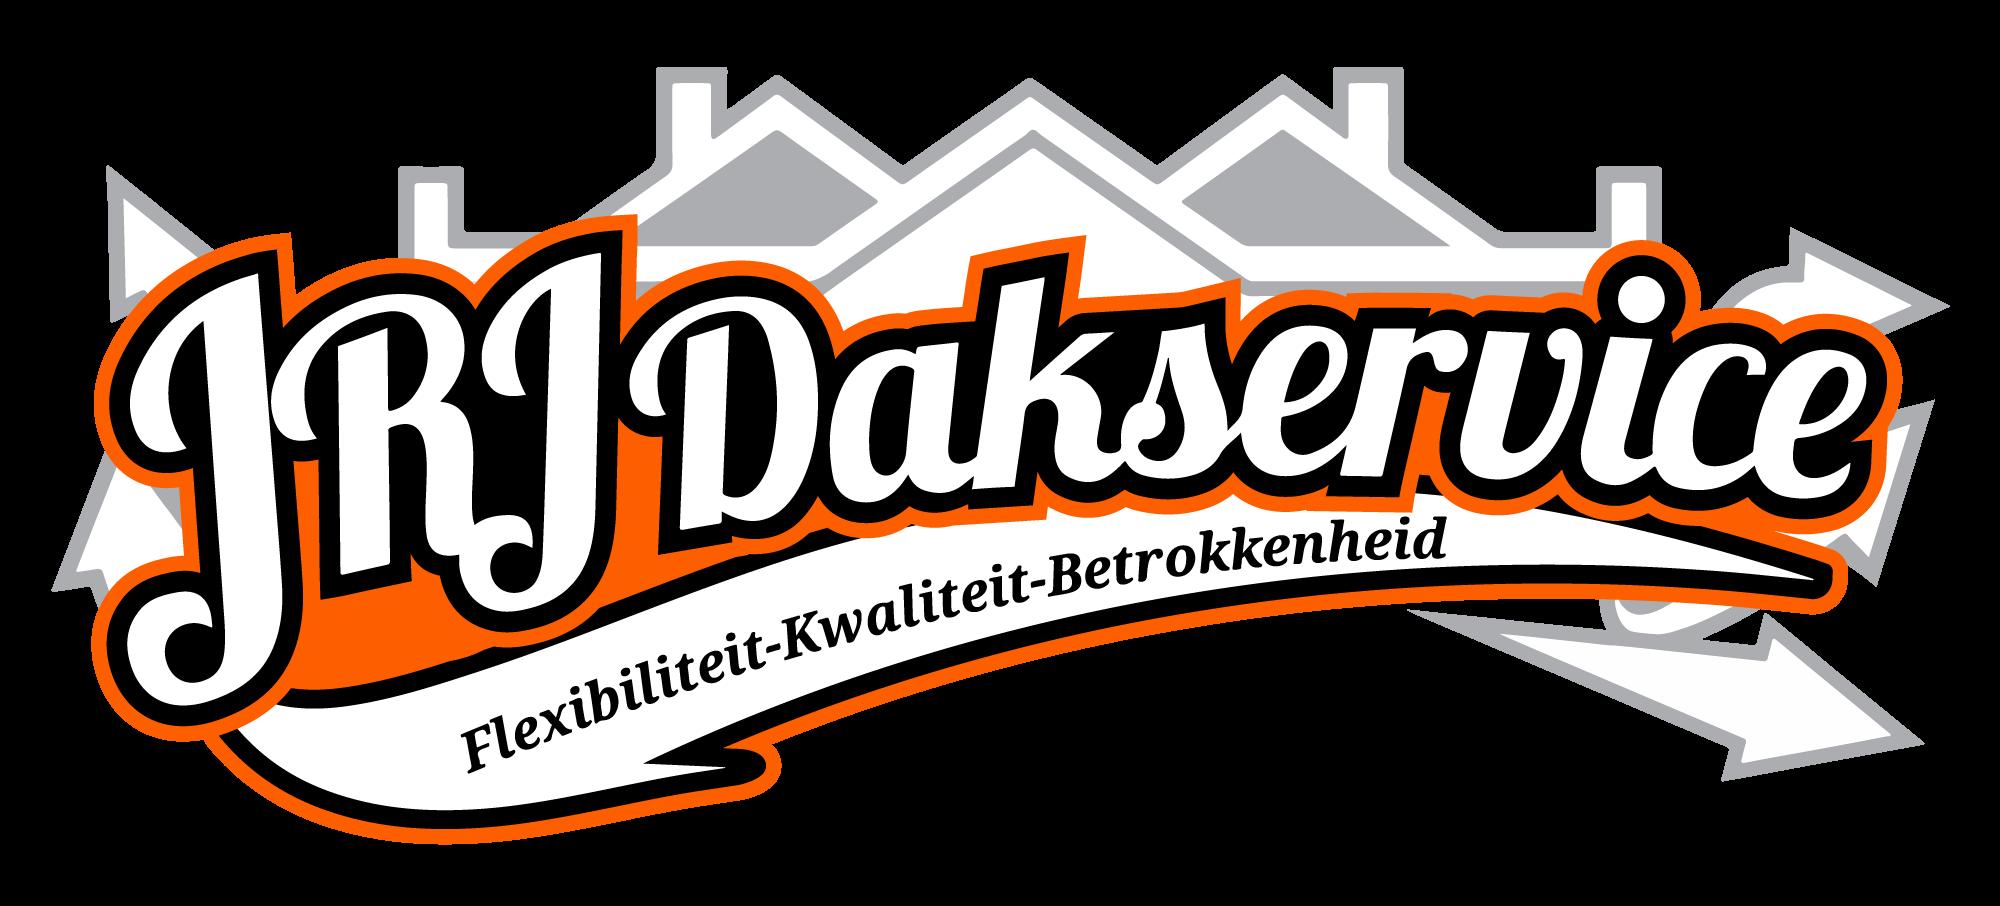 JRJ Dakservice